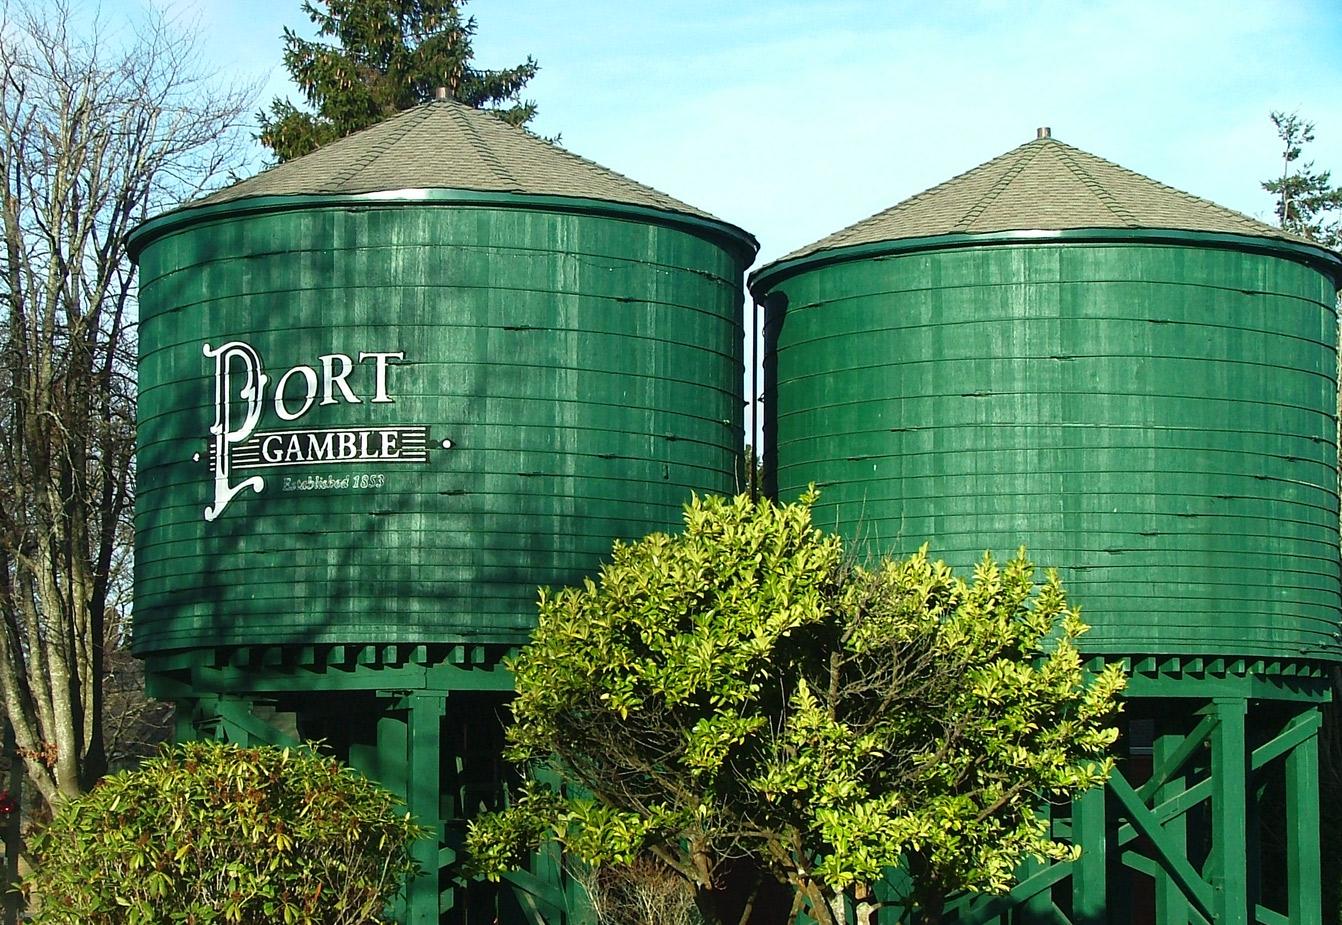 Port Gamble, Washington